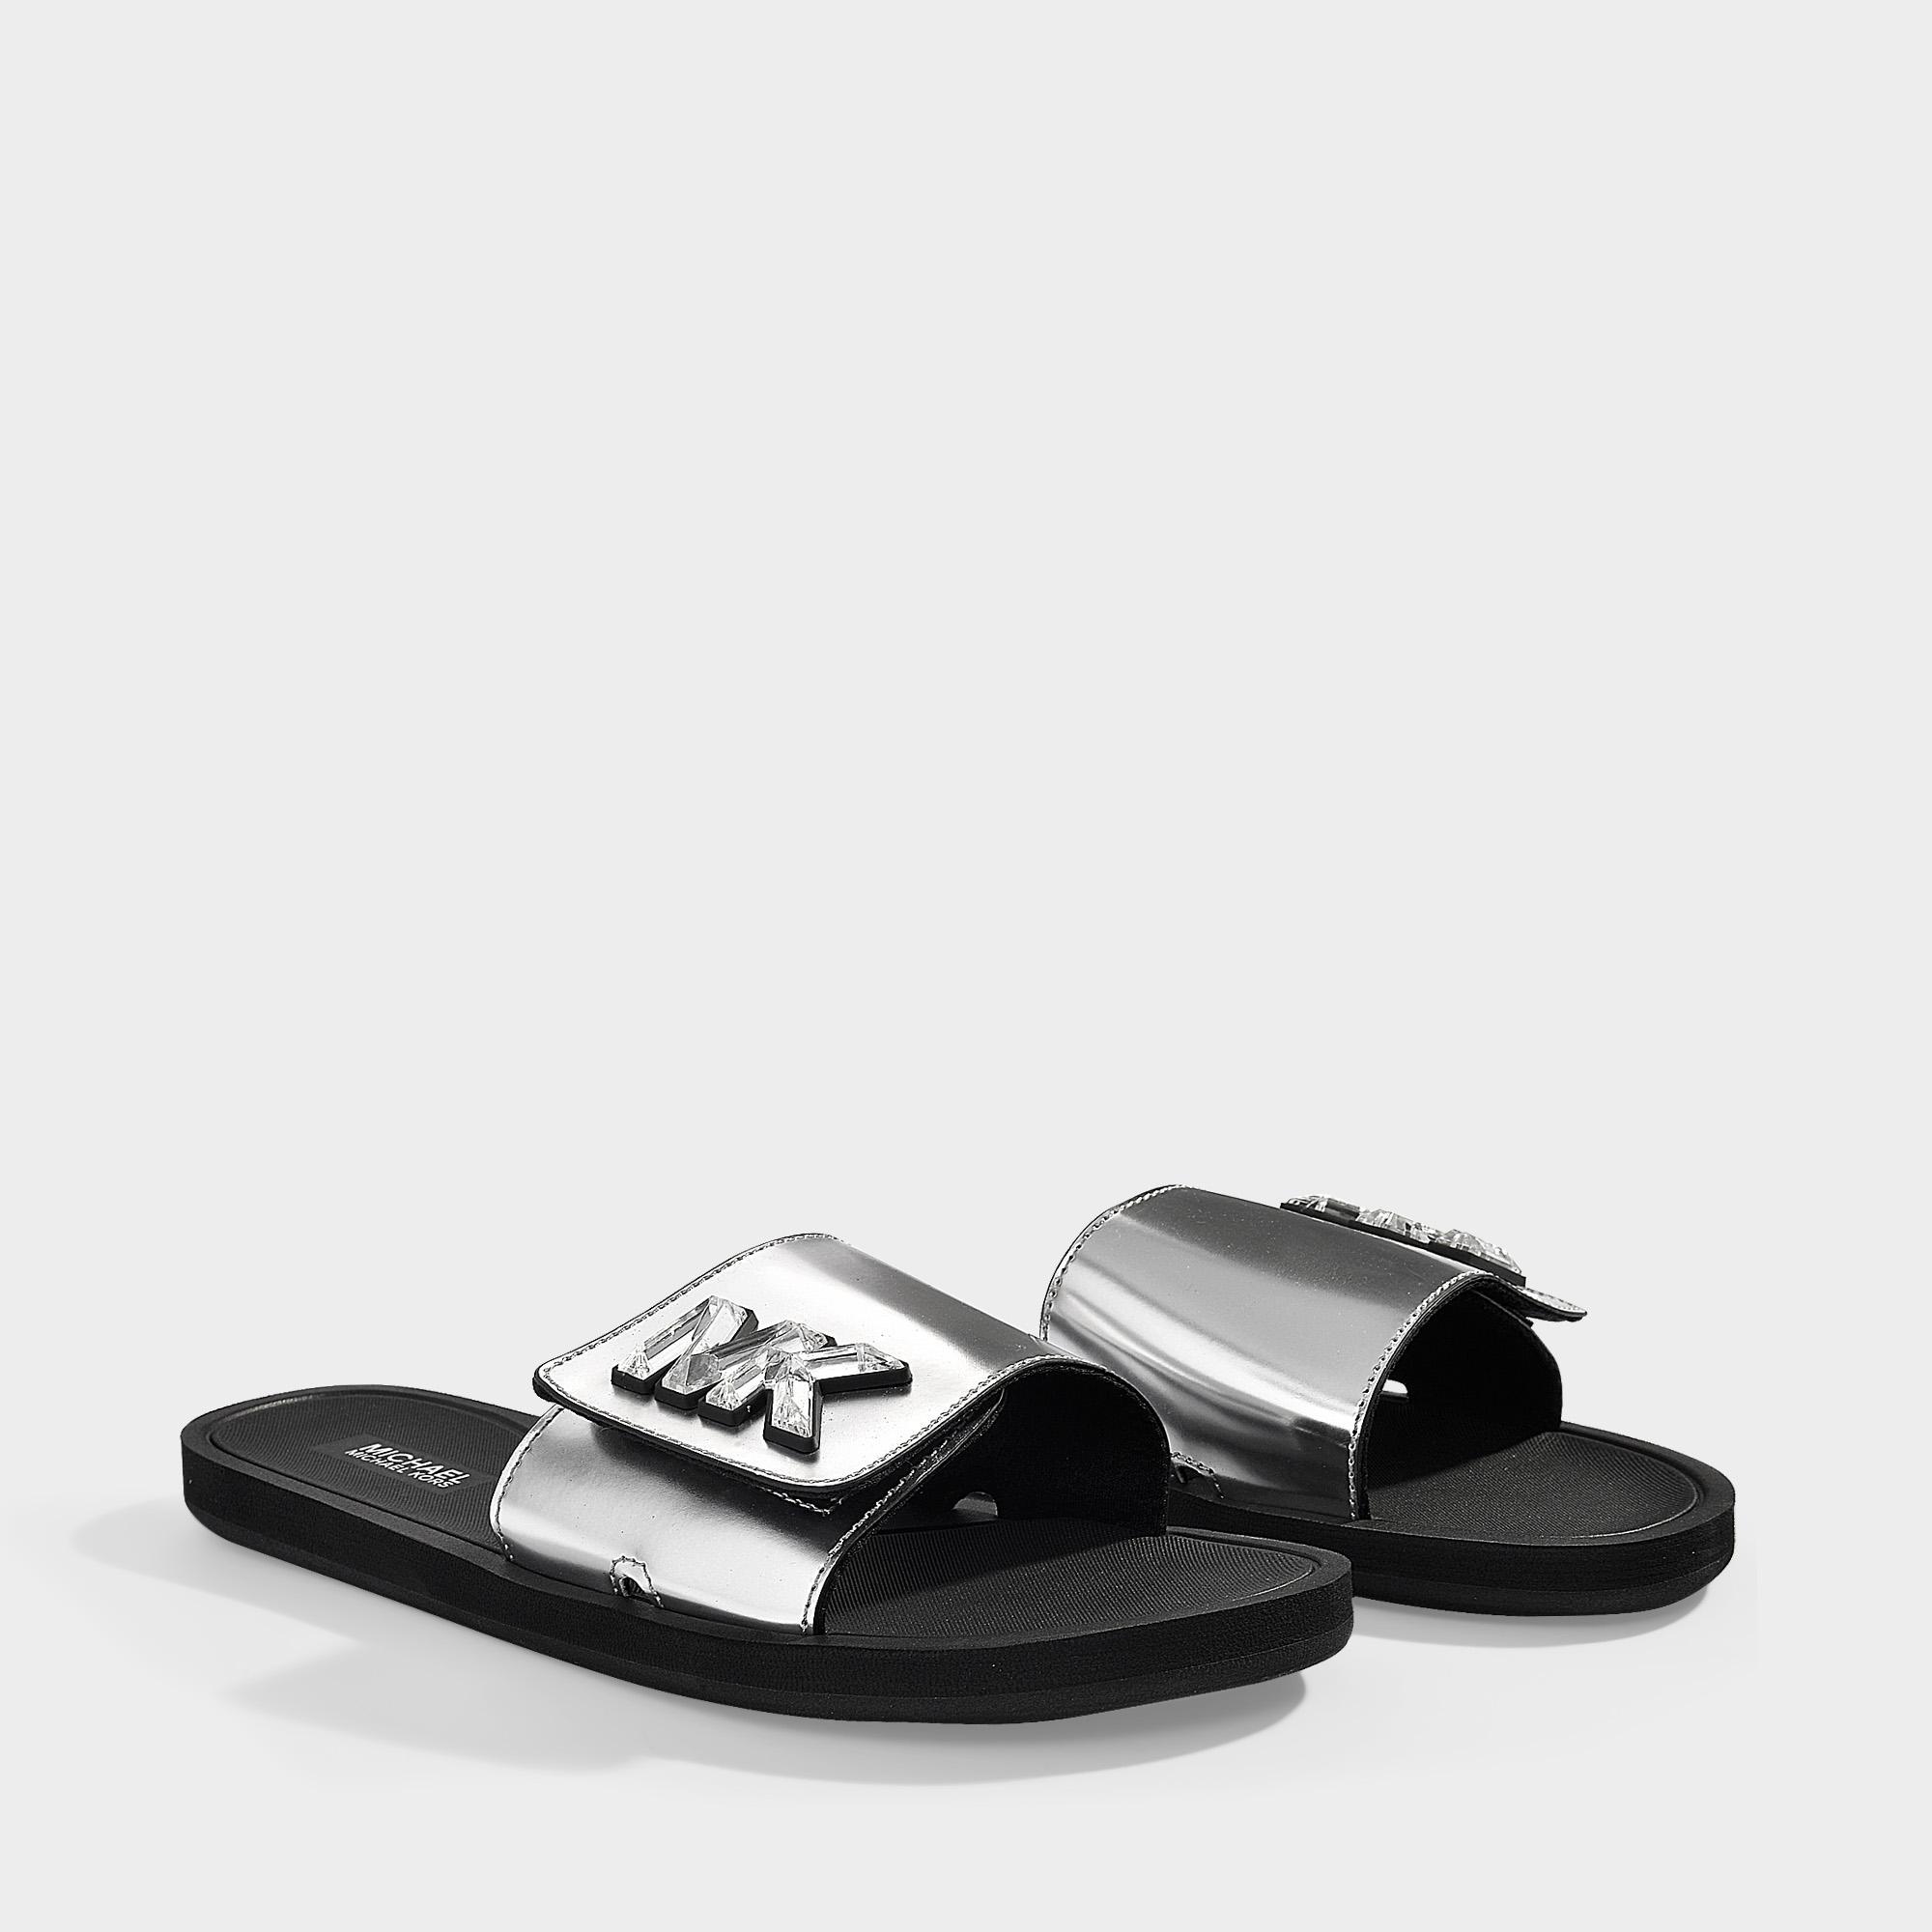 3149039021f6 MICHAEL Michael Kors - Gray Mk Slides In Silver Mirror Metallic Material  And Crystals - Lyst. View fullscreen